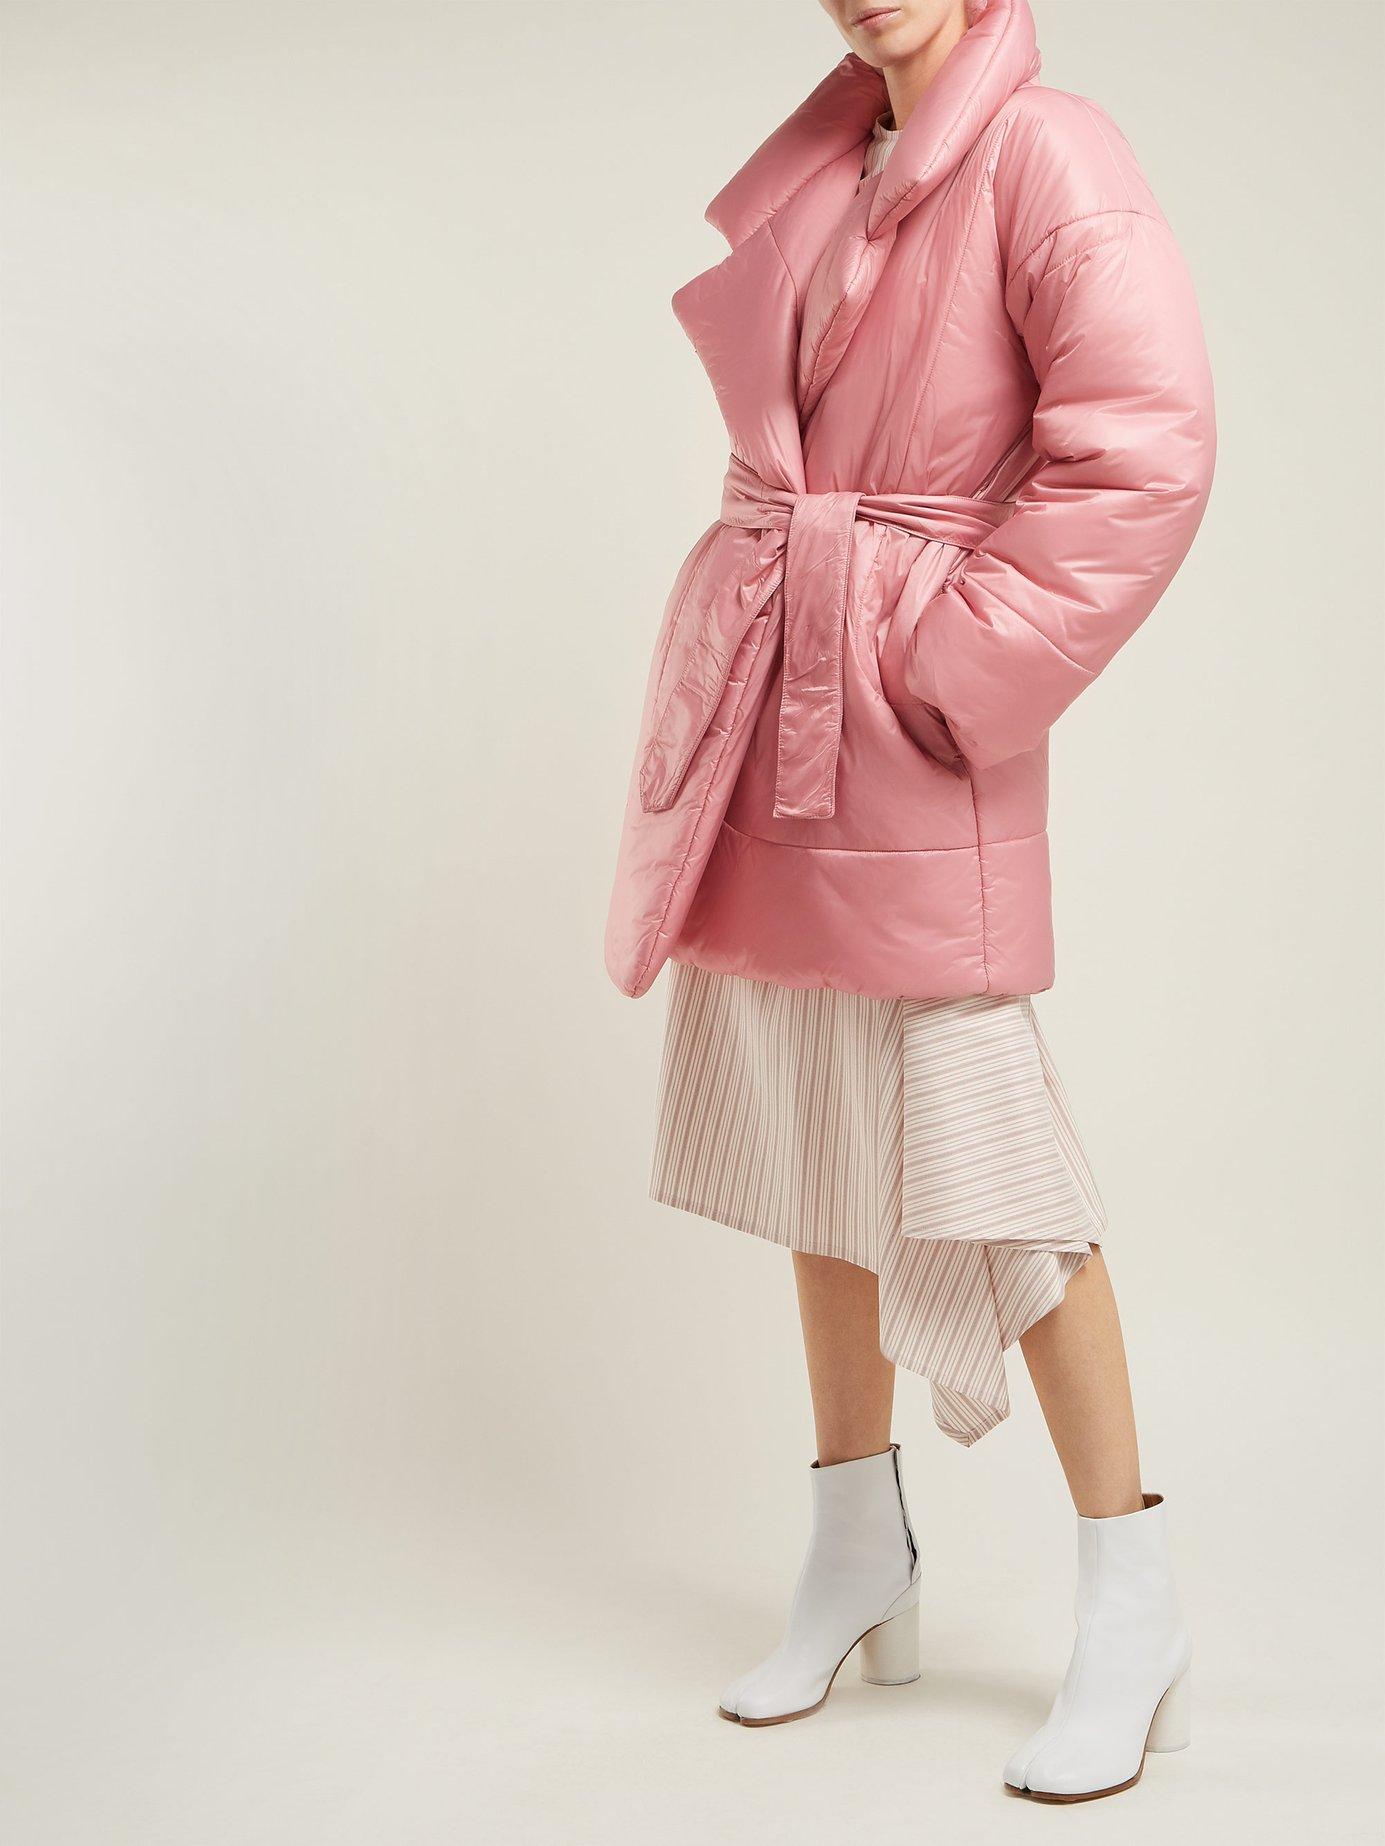 Norma Kamali Pink.jpg